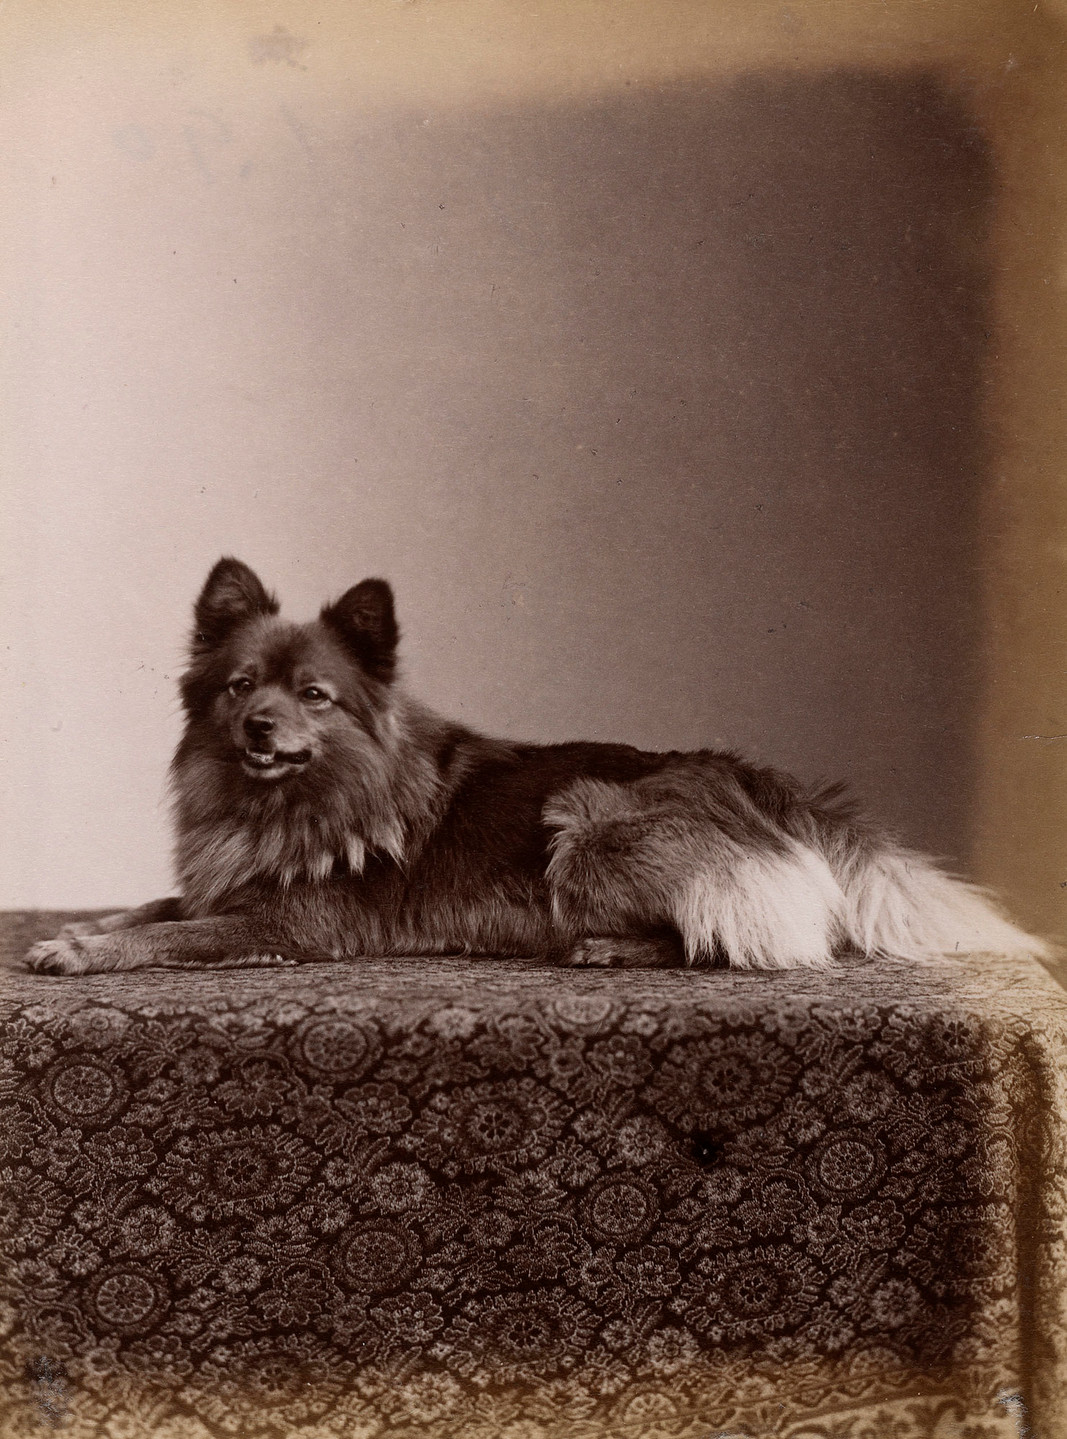 'Marco', Queen Victoria's pet Pomeranian dog